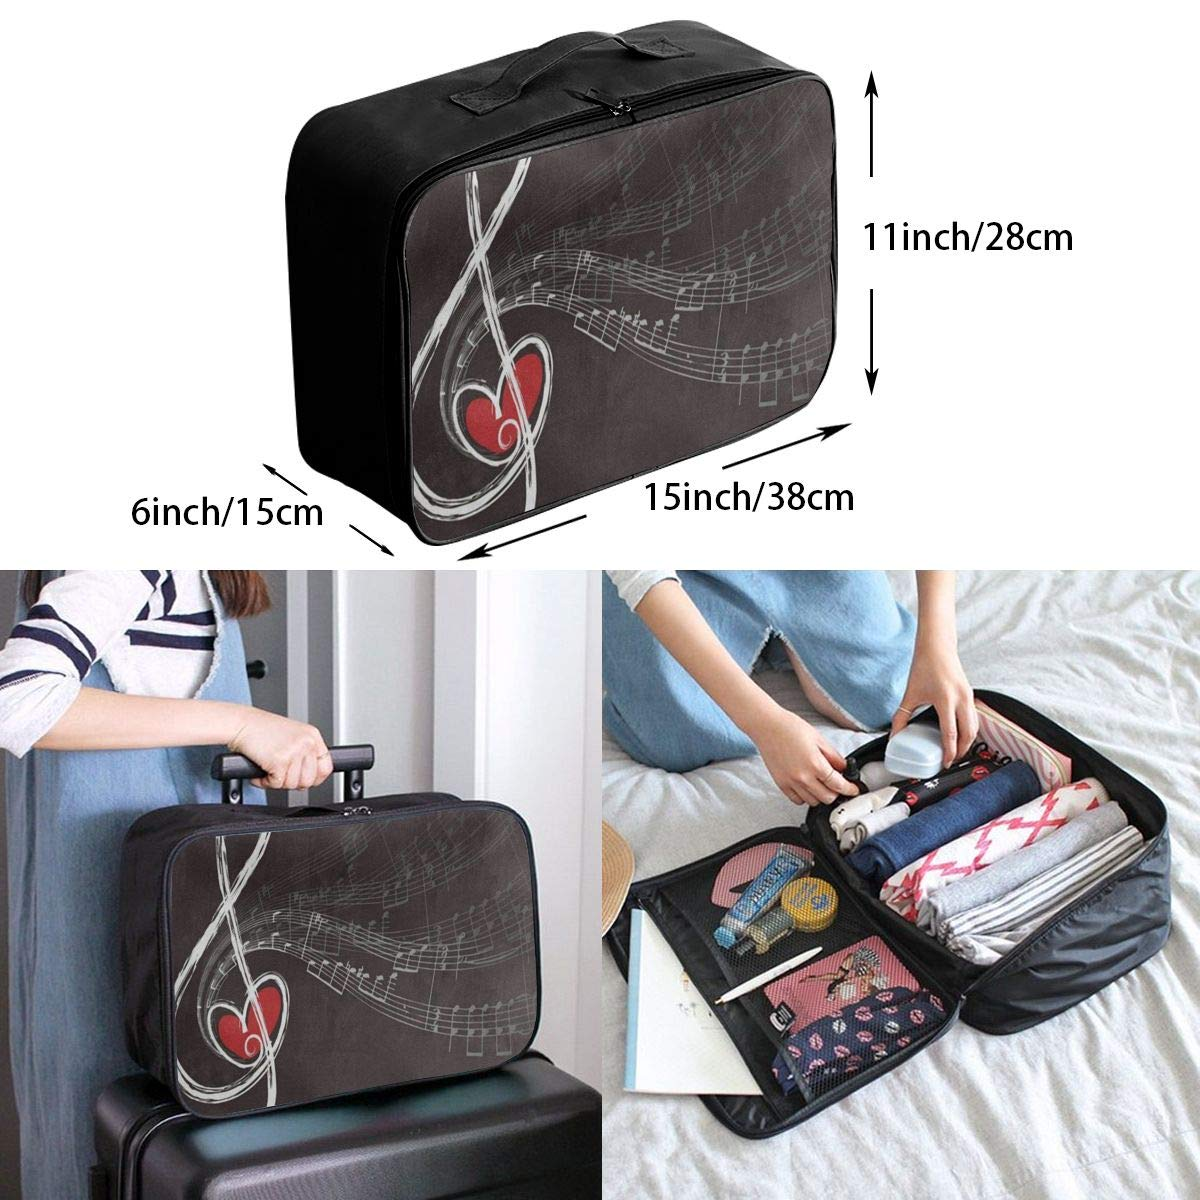 Luggage Bag Travel Duffel Bag Waterproof Treble Love Music Note Lightweight Large Capacity Portable Storage Bag